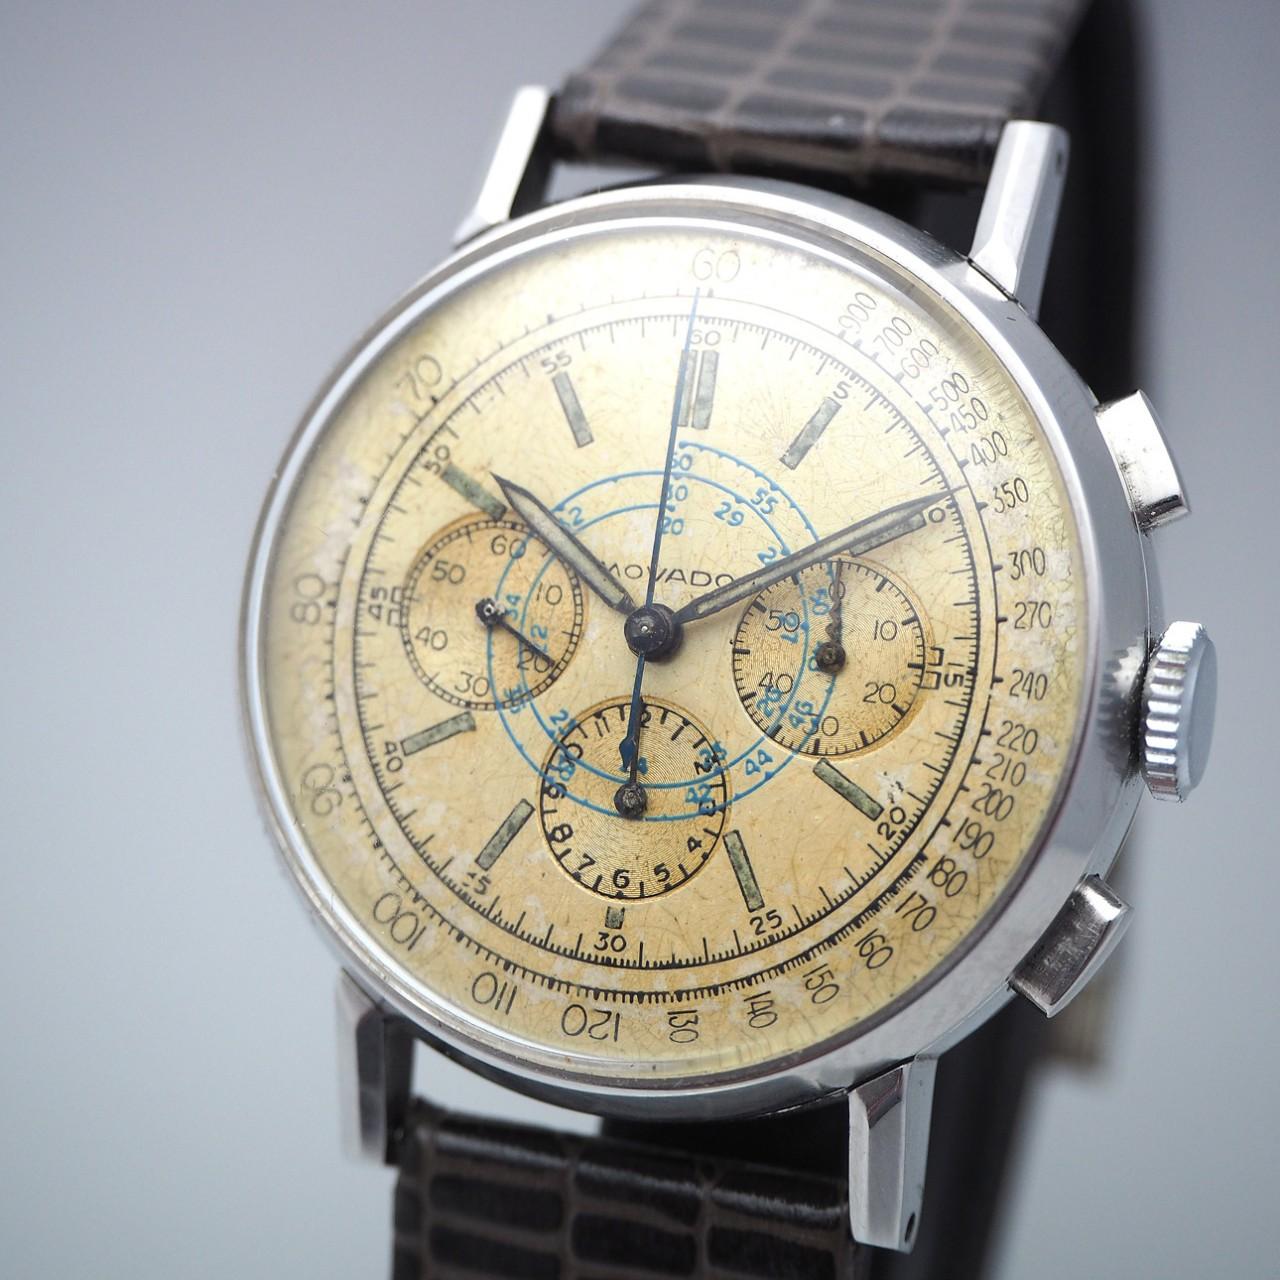 Movado Chronograph Vintage Ref.: 19024 Cal.90